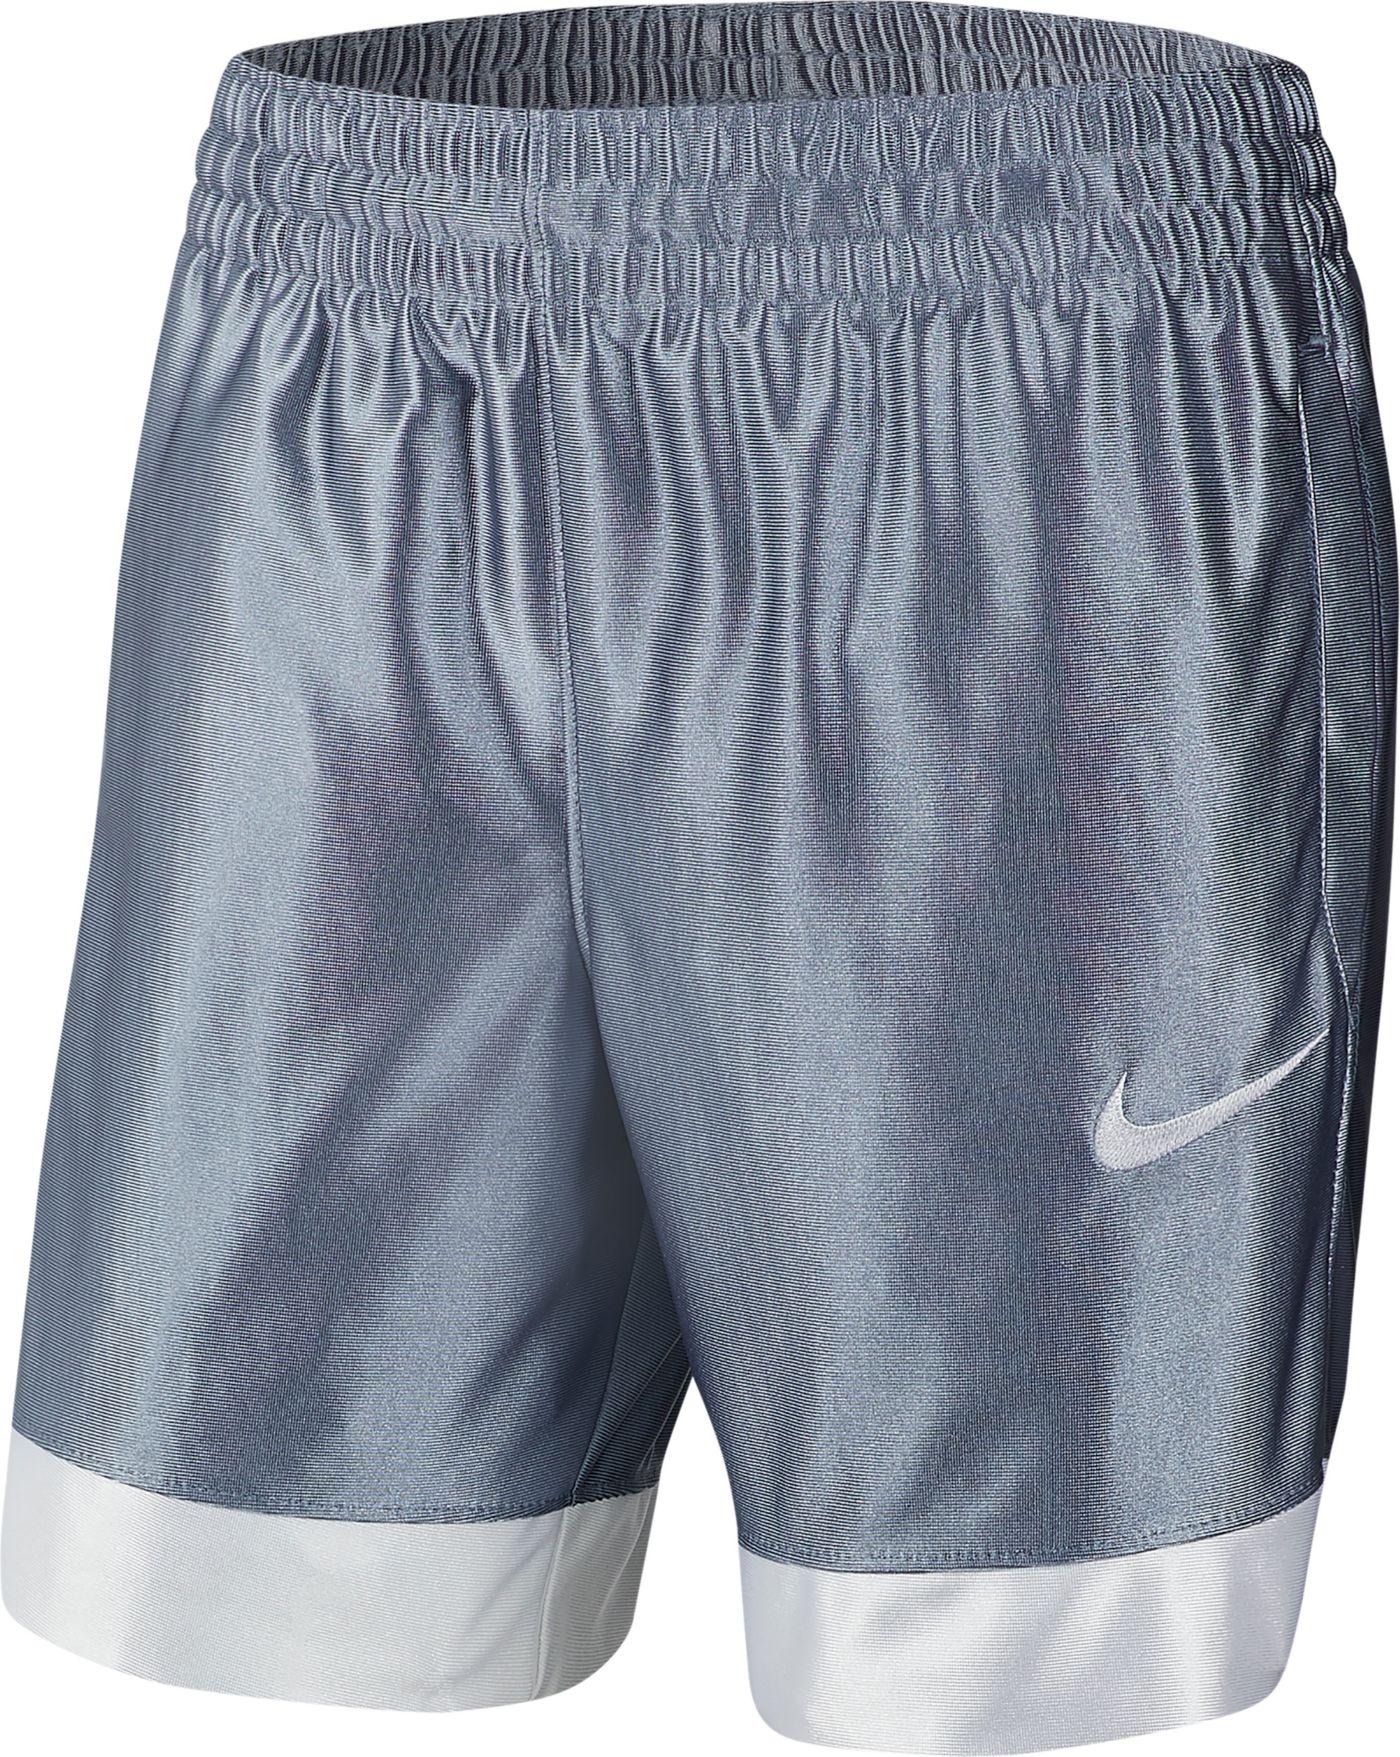 Nike Girls' Court Basketball Shorts